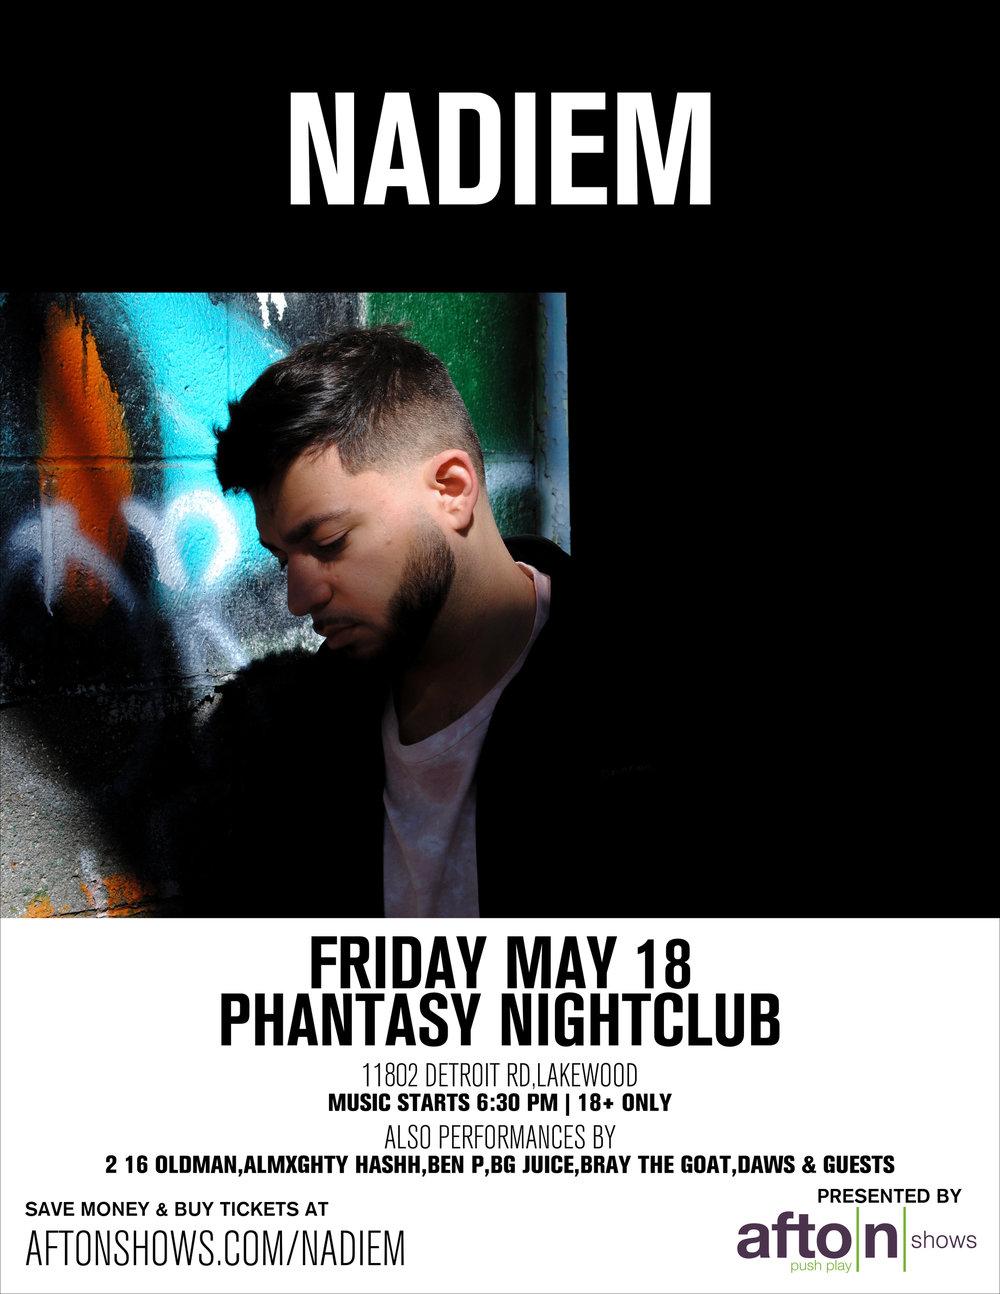 PhantasyNightclub-May18-2.jpg